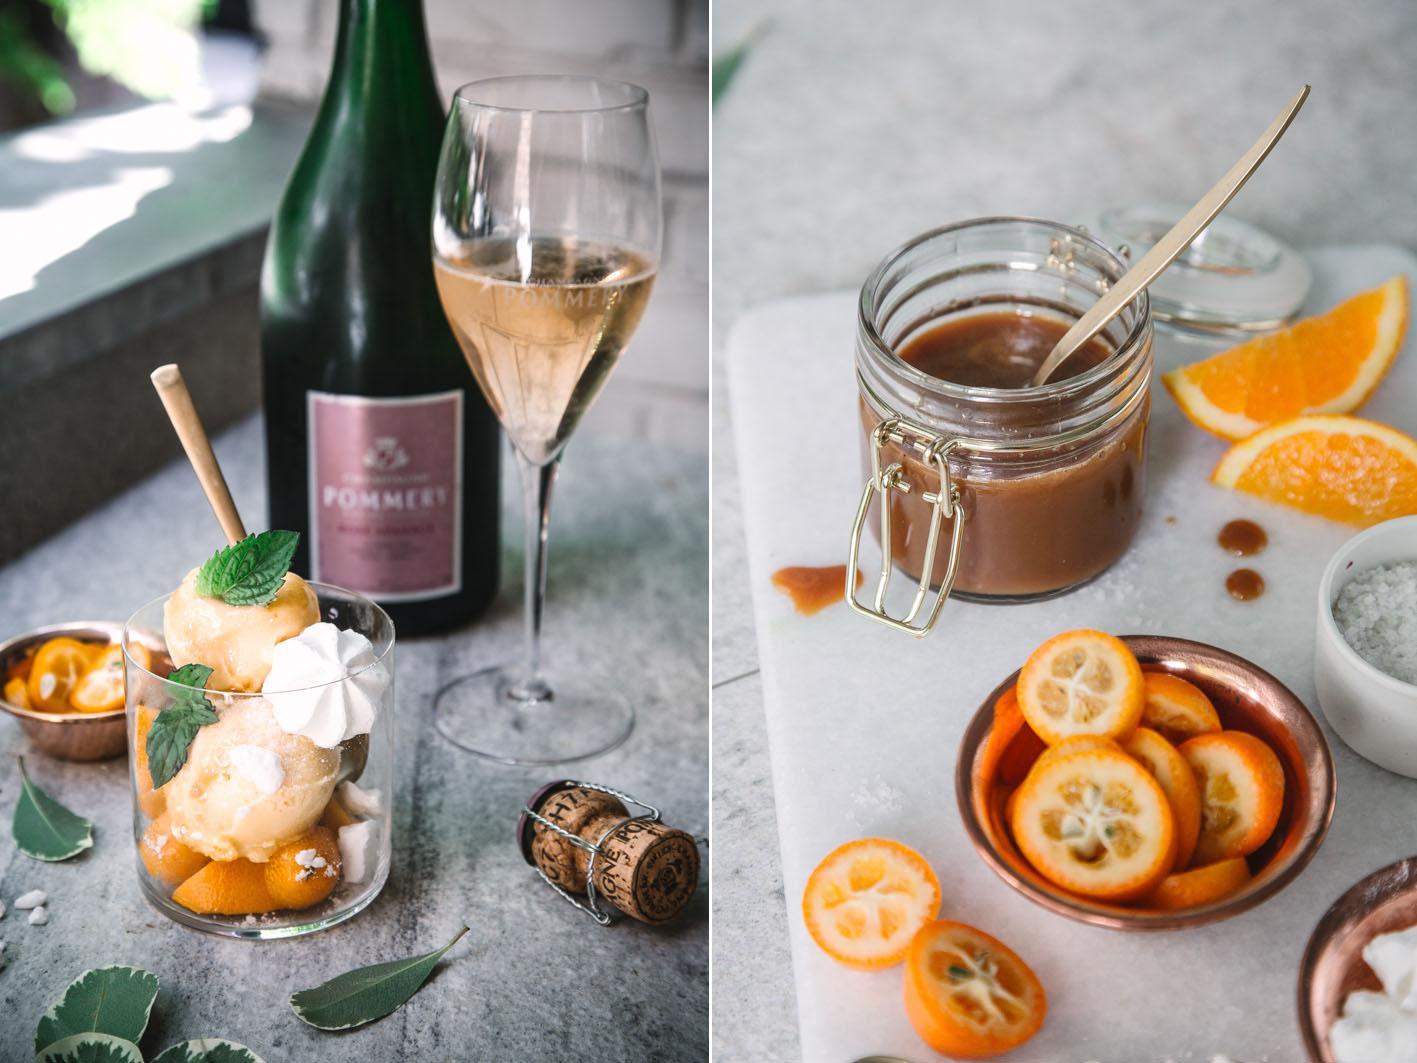 Champagner-Orangensorbet mit Salzkaramell